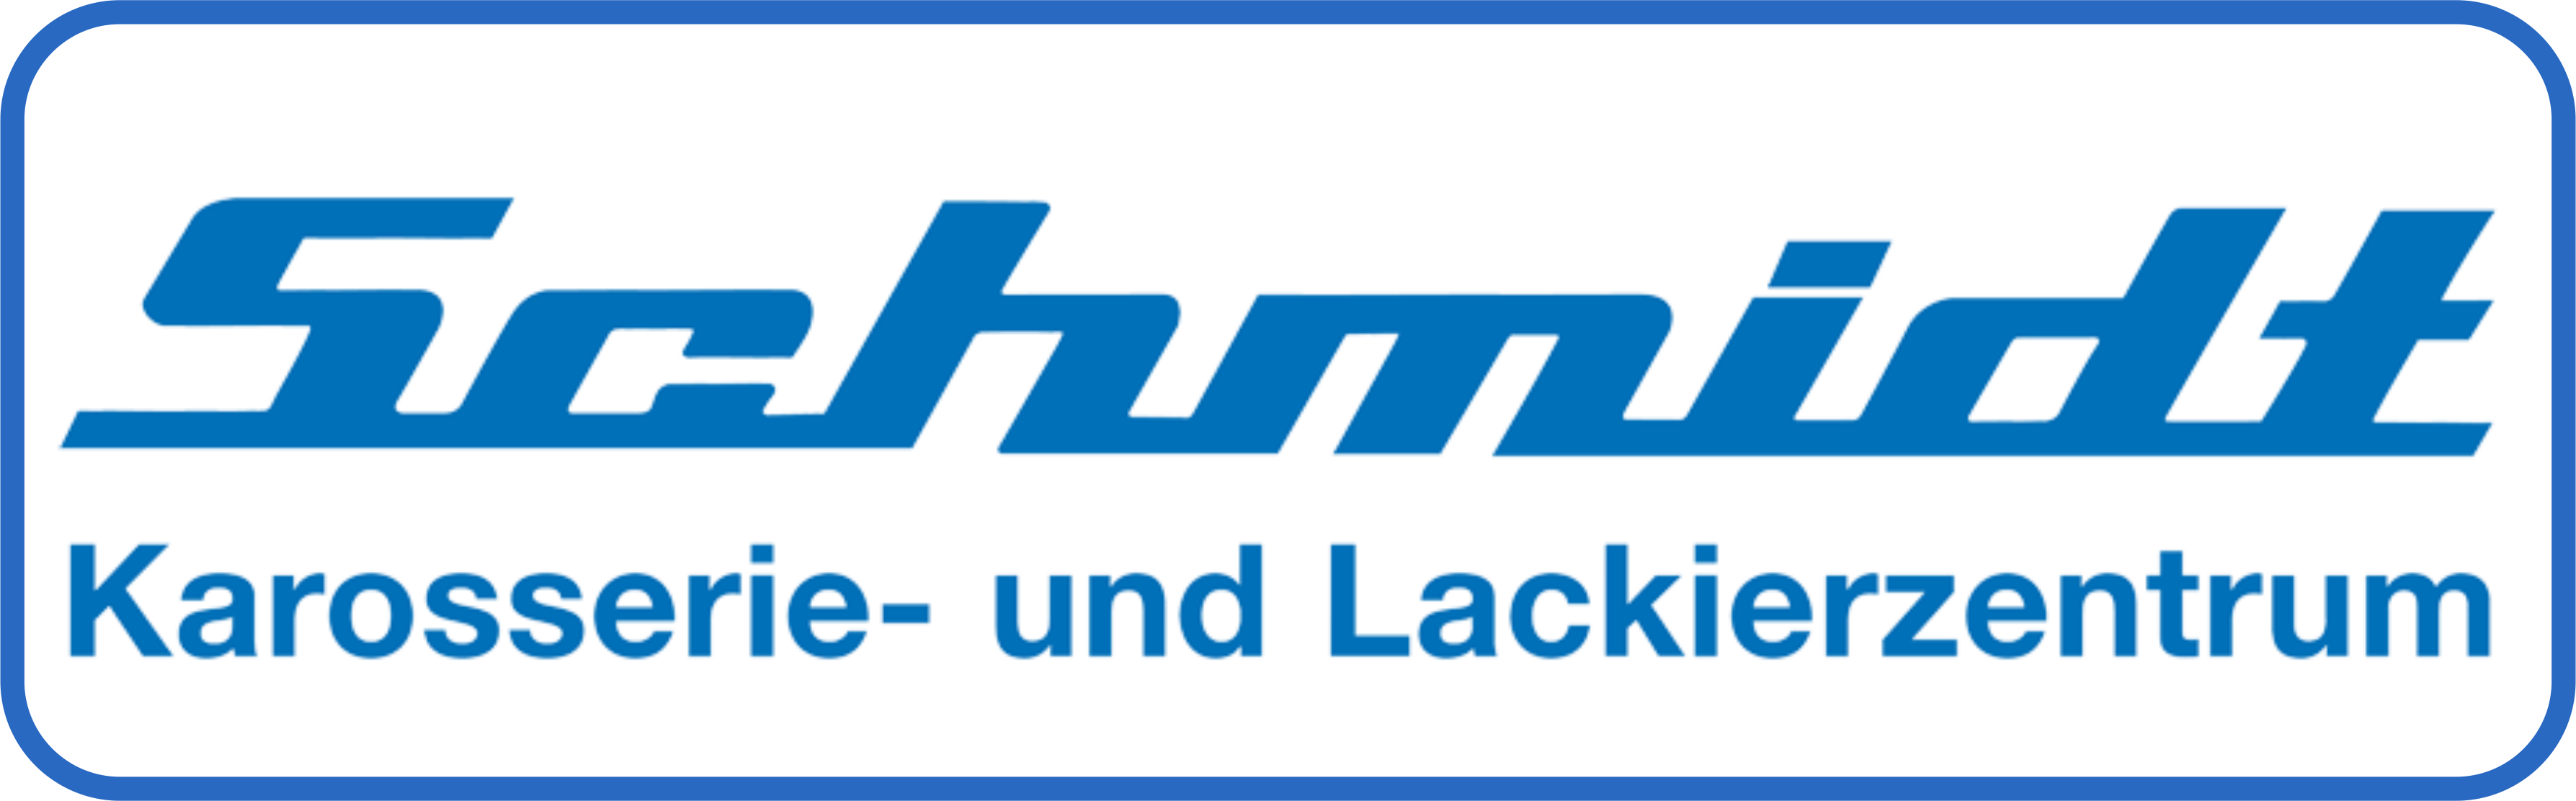 Karosserie- und Lackierzentrum Schmidt Nürnberg